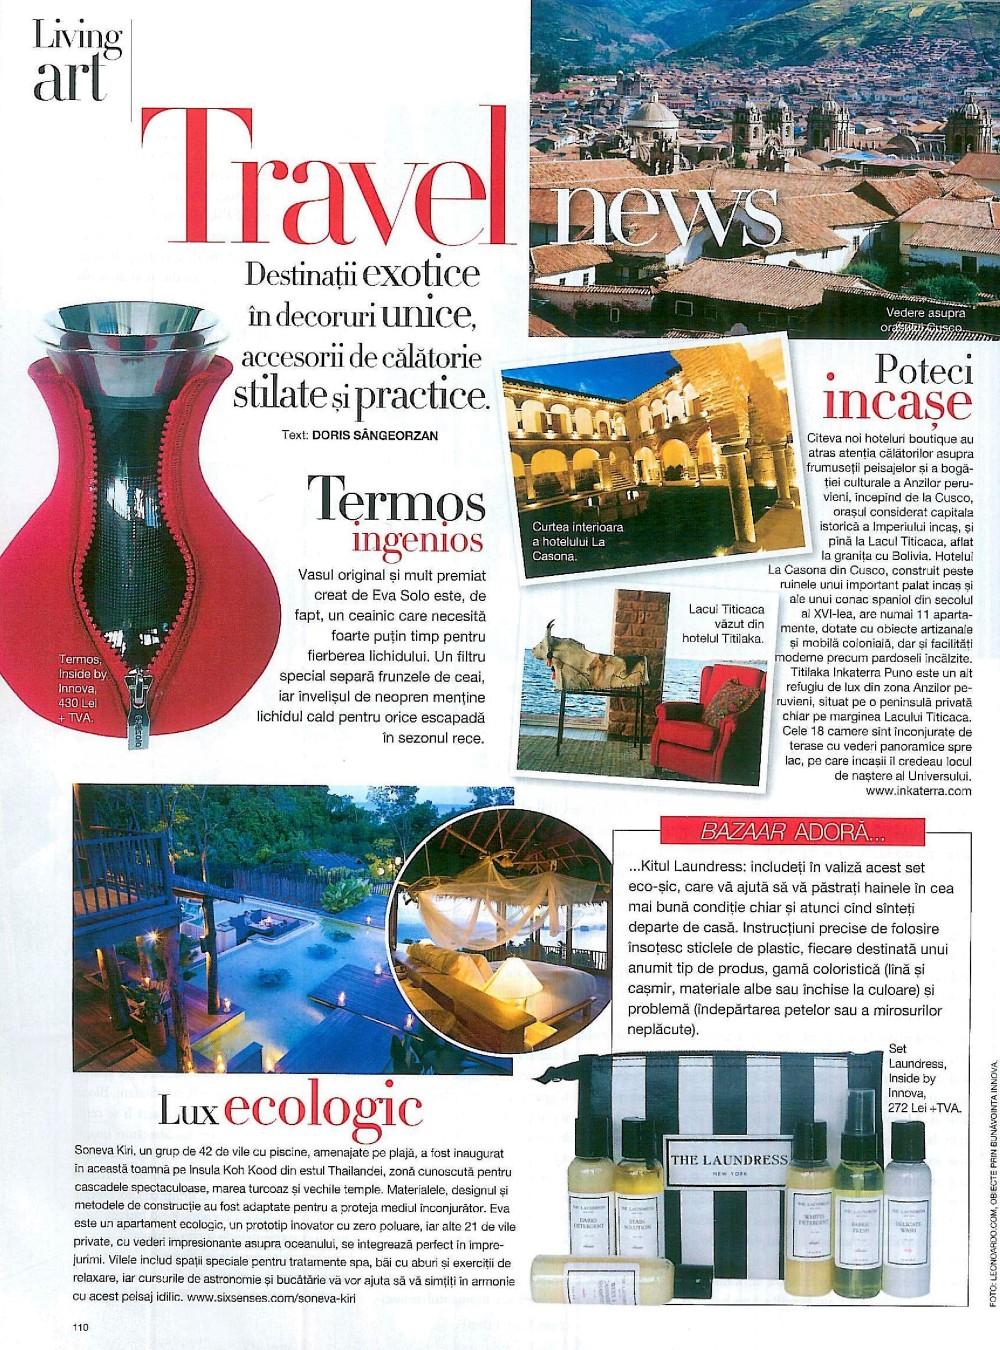 Harpers Bazaar Ro Travel News nov 2008-page-001